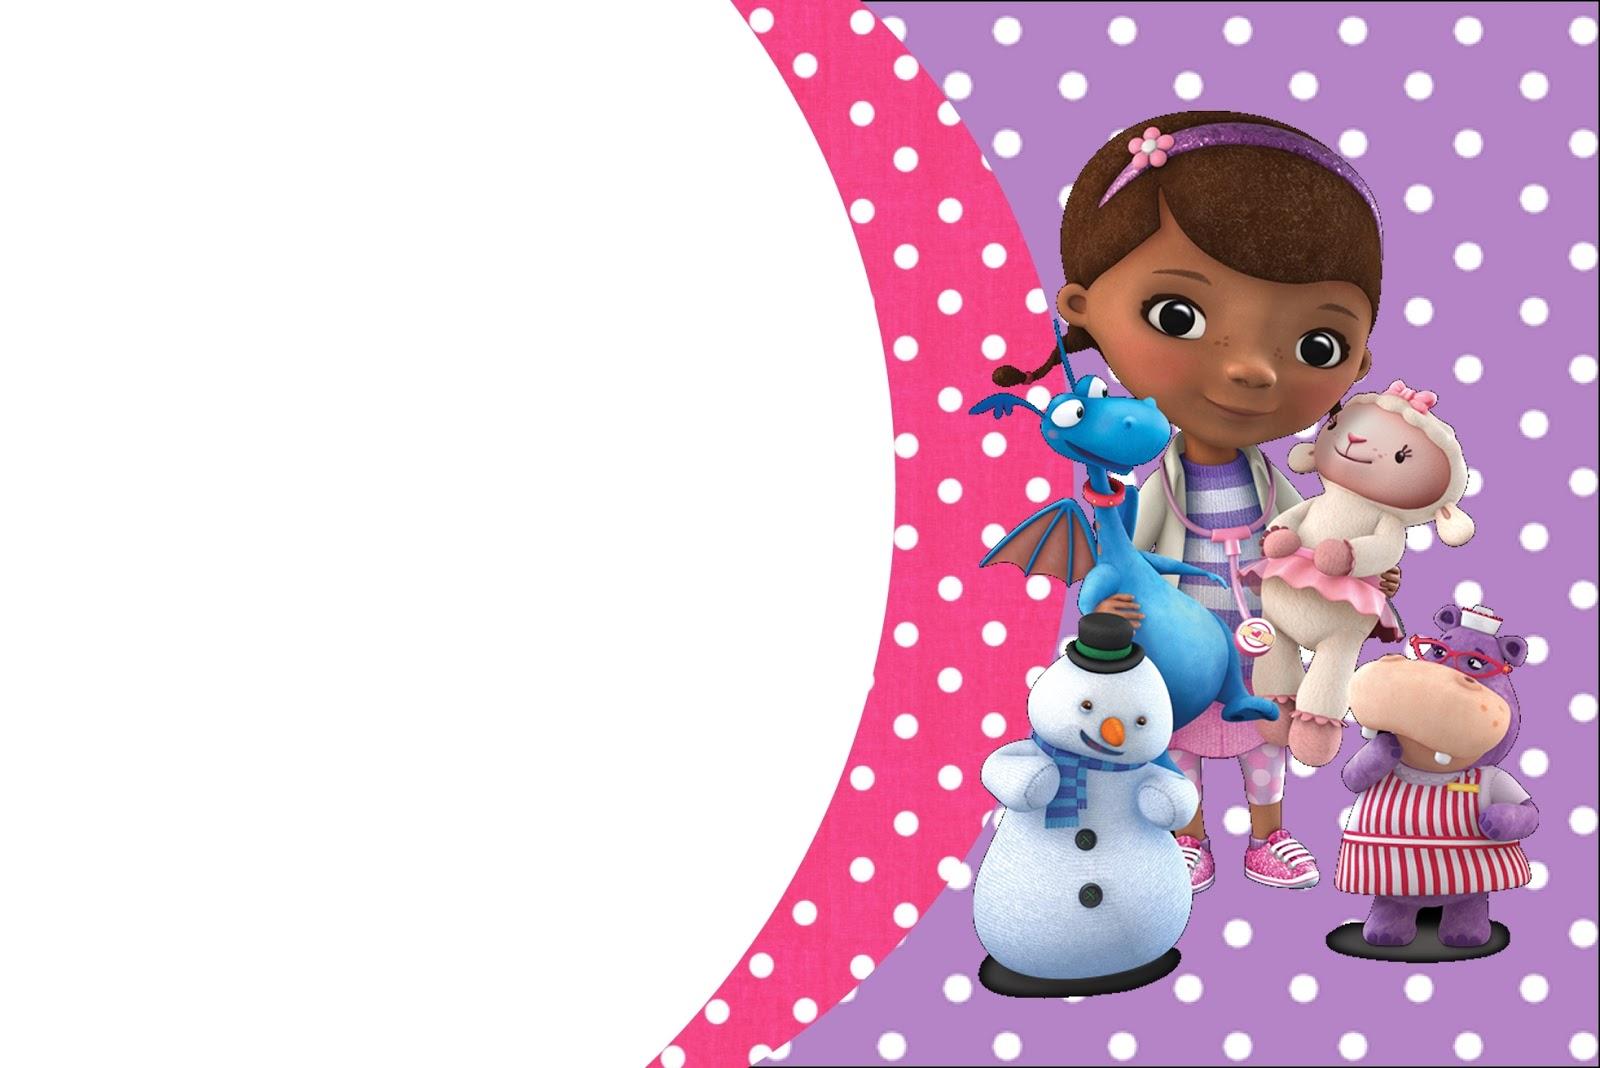 Doutora Brinquedos Doc Mcstuffins Kit Completo Com